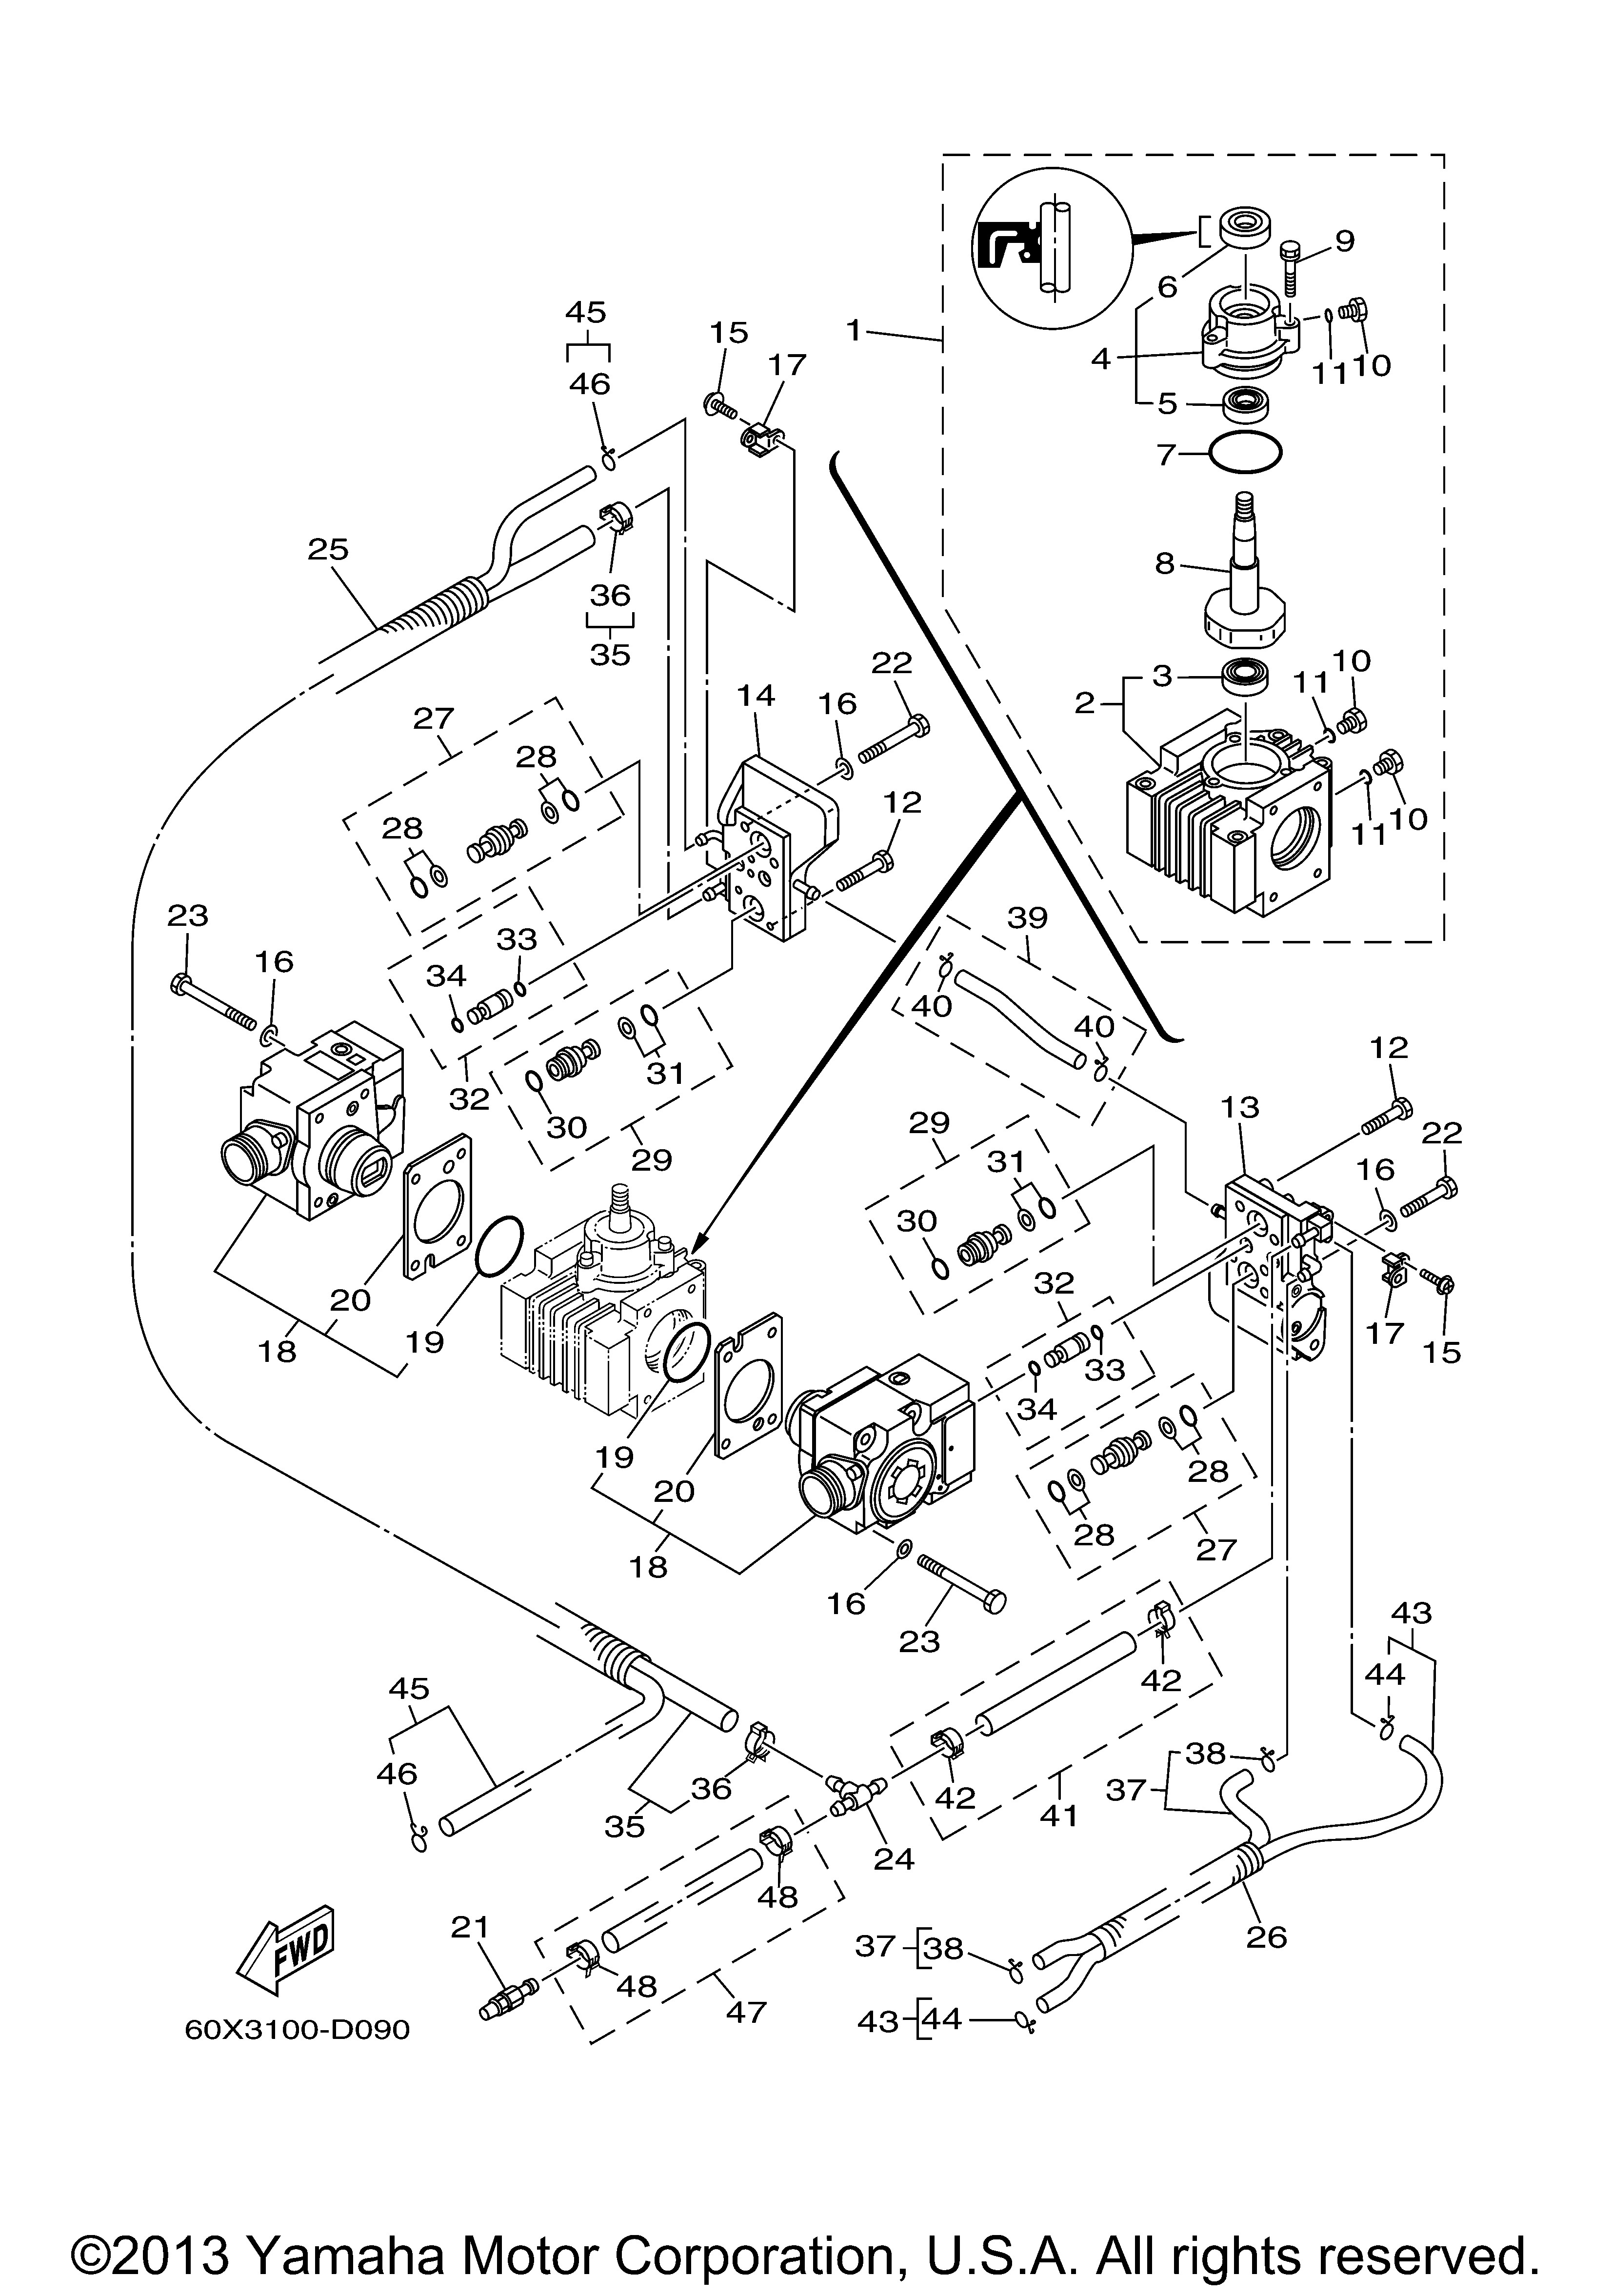 Yamaha OEM Part 68F-2466A-00-00 Injector pump packing